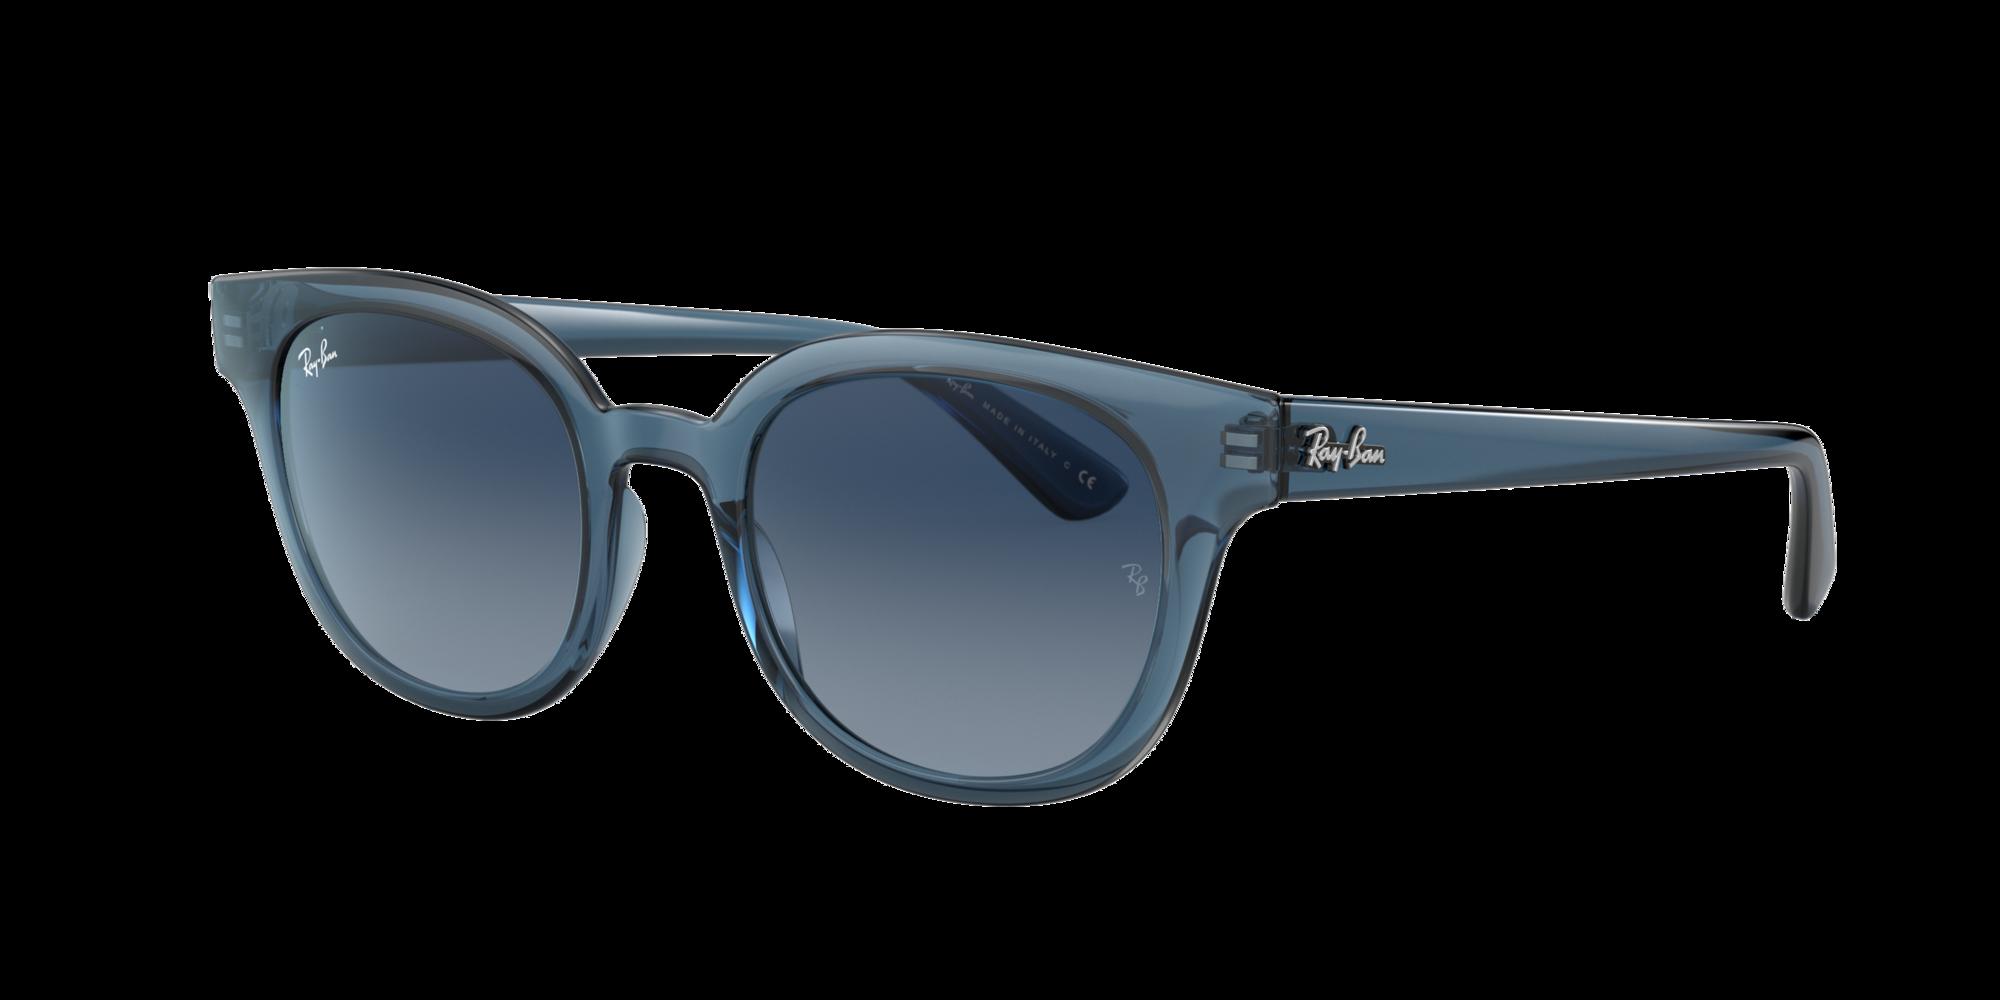 Ray Ban Unisex  RB4324 -  Frame color: Blue, Lens color: Blue Gradient, Size 50-21/150